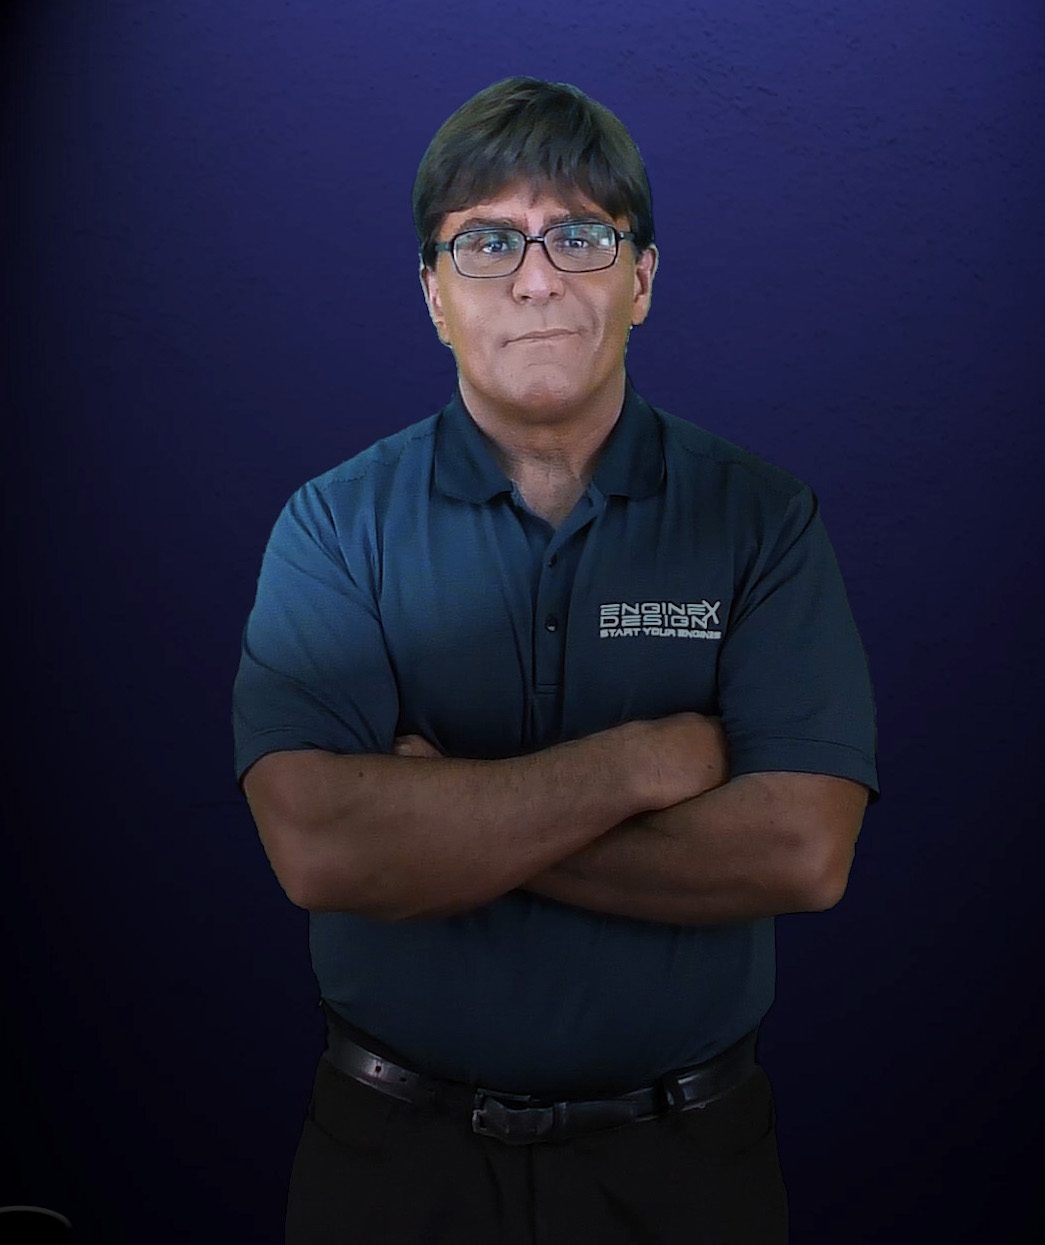 enginex president